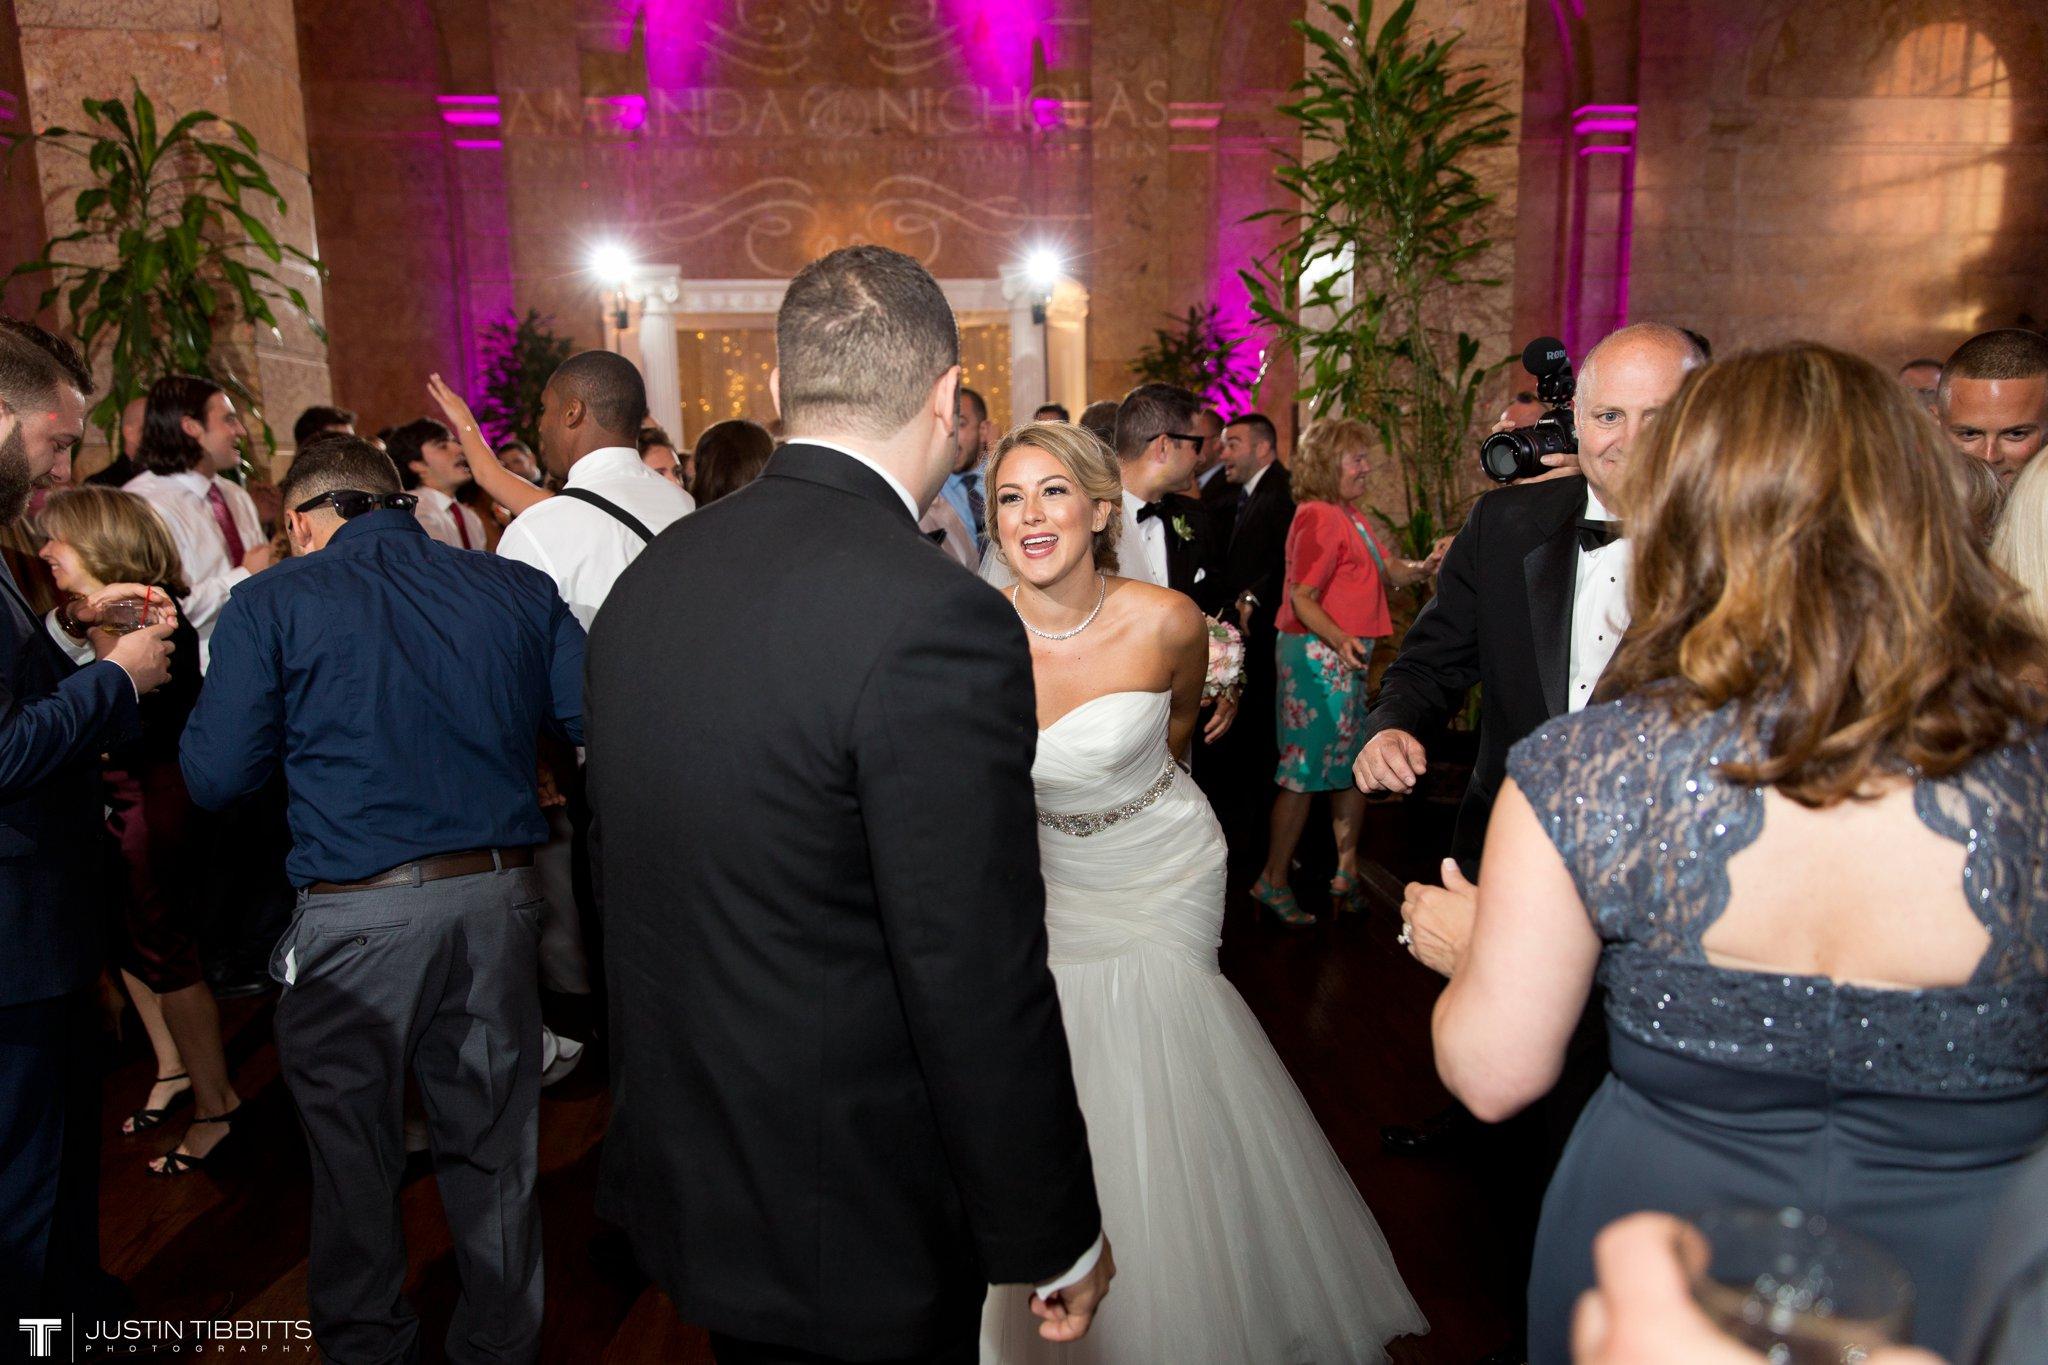 state-room-wedding-photos-with-amanda-and-nick_0151